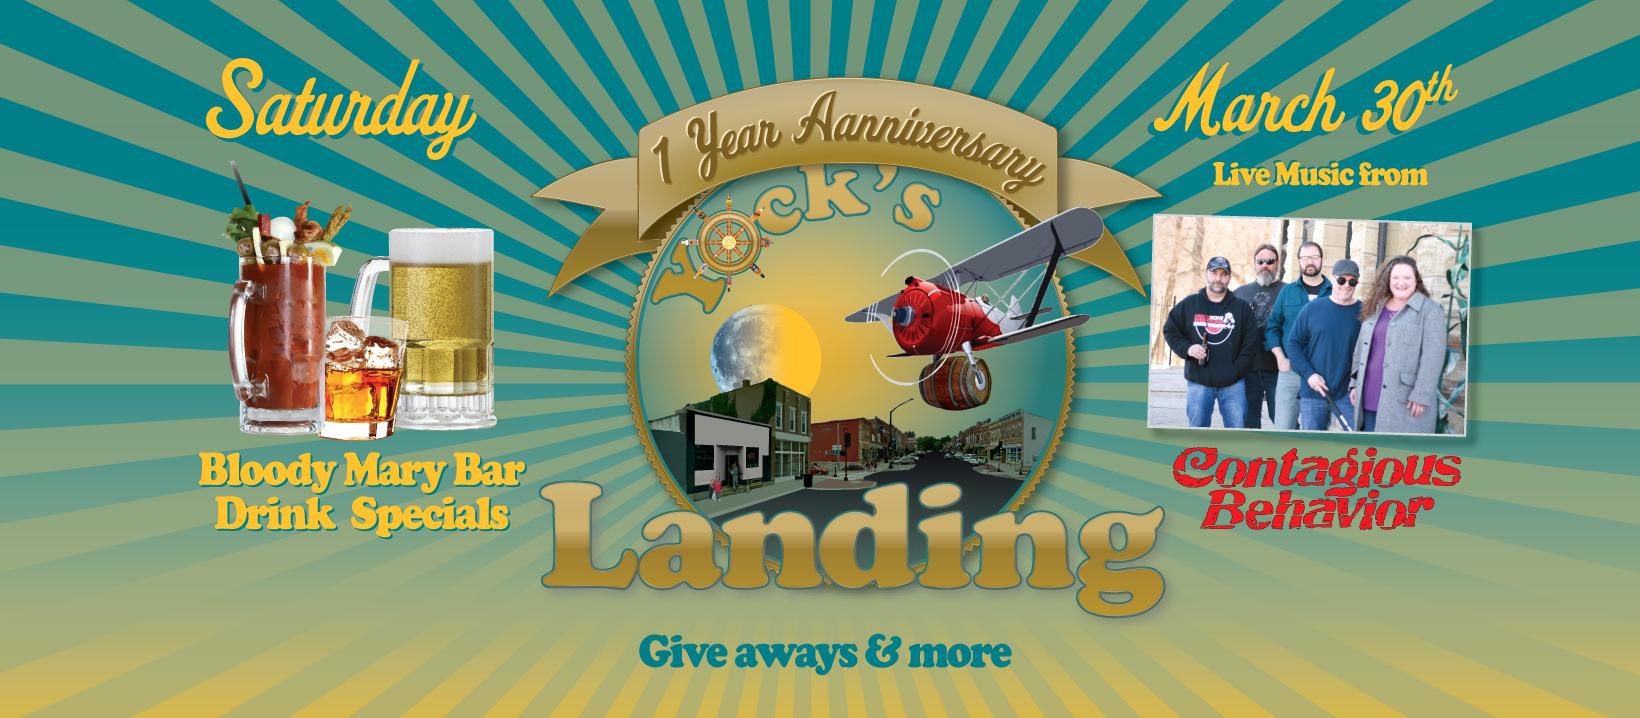 yocks-landing-anniversary_2019